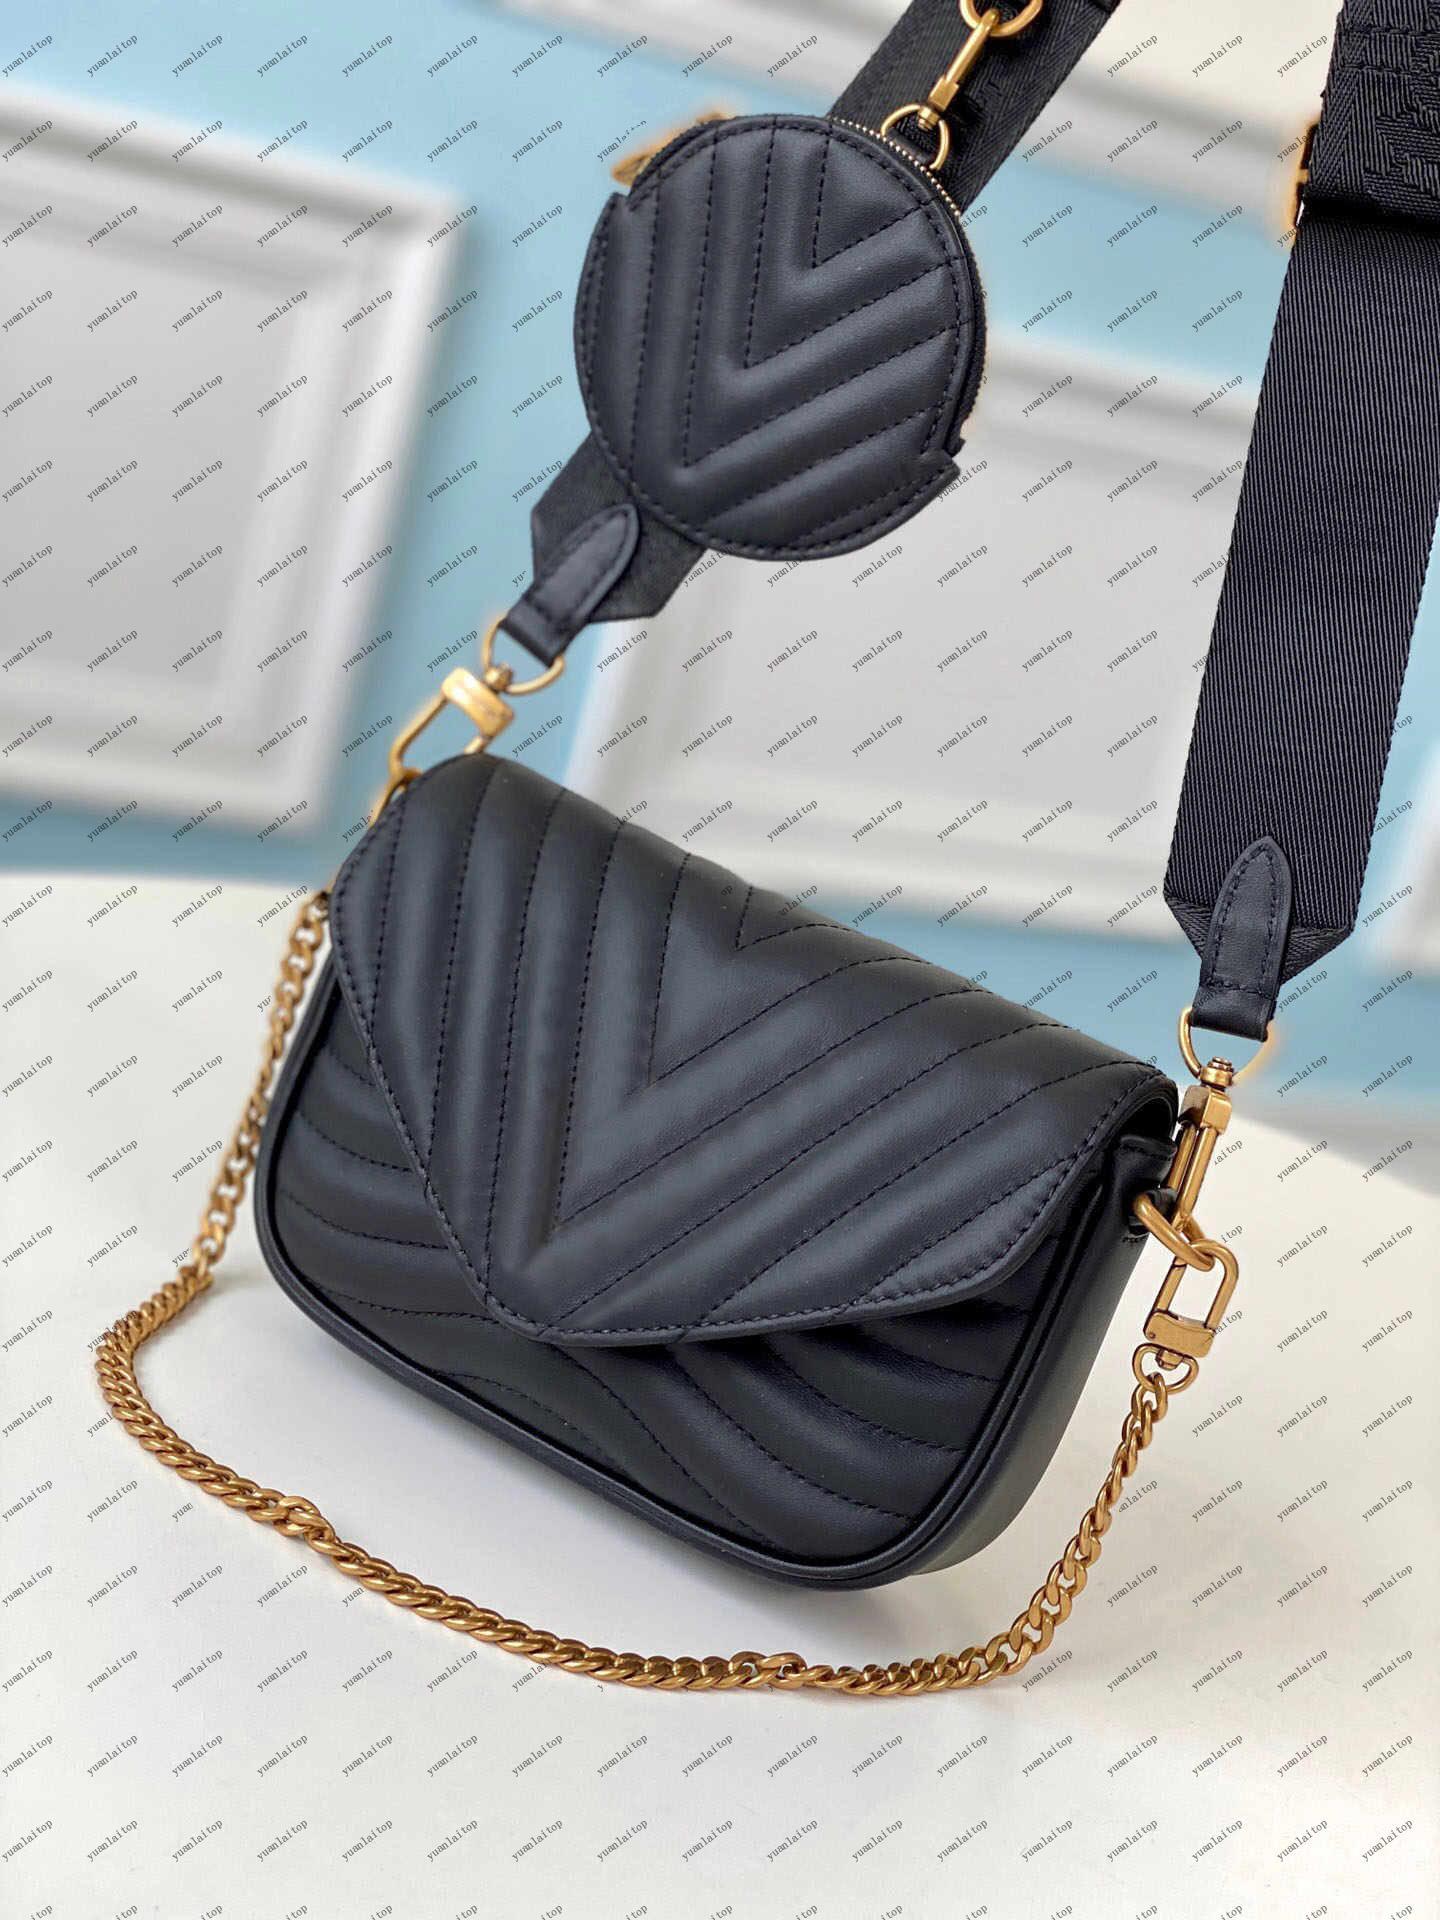 Free Bolbag Freight Shop Bag Bag Big Calidad Bolso Bolso Cuero Lady Designer Mejor L018 Designer CLQRF